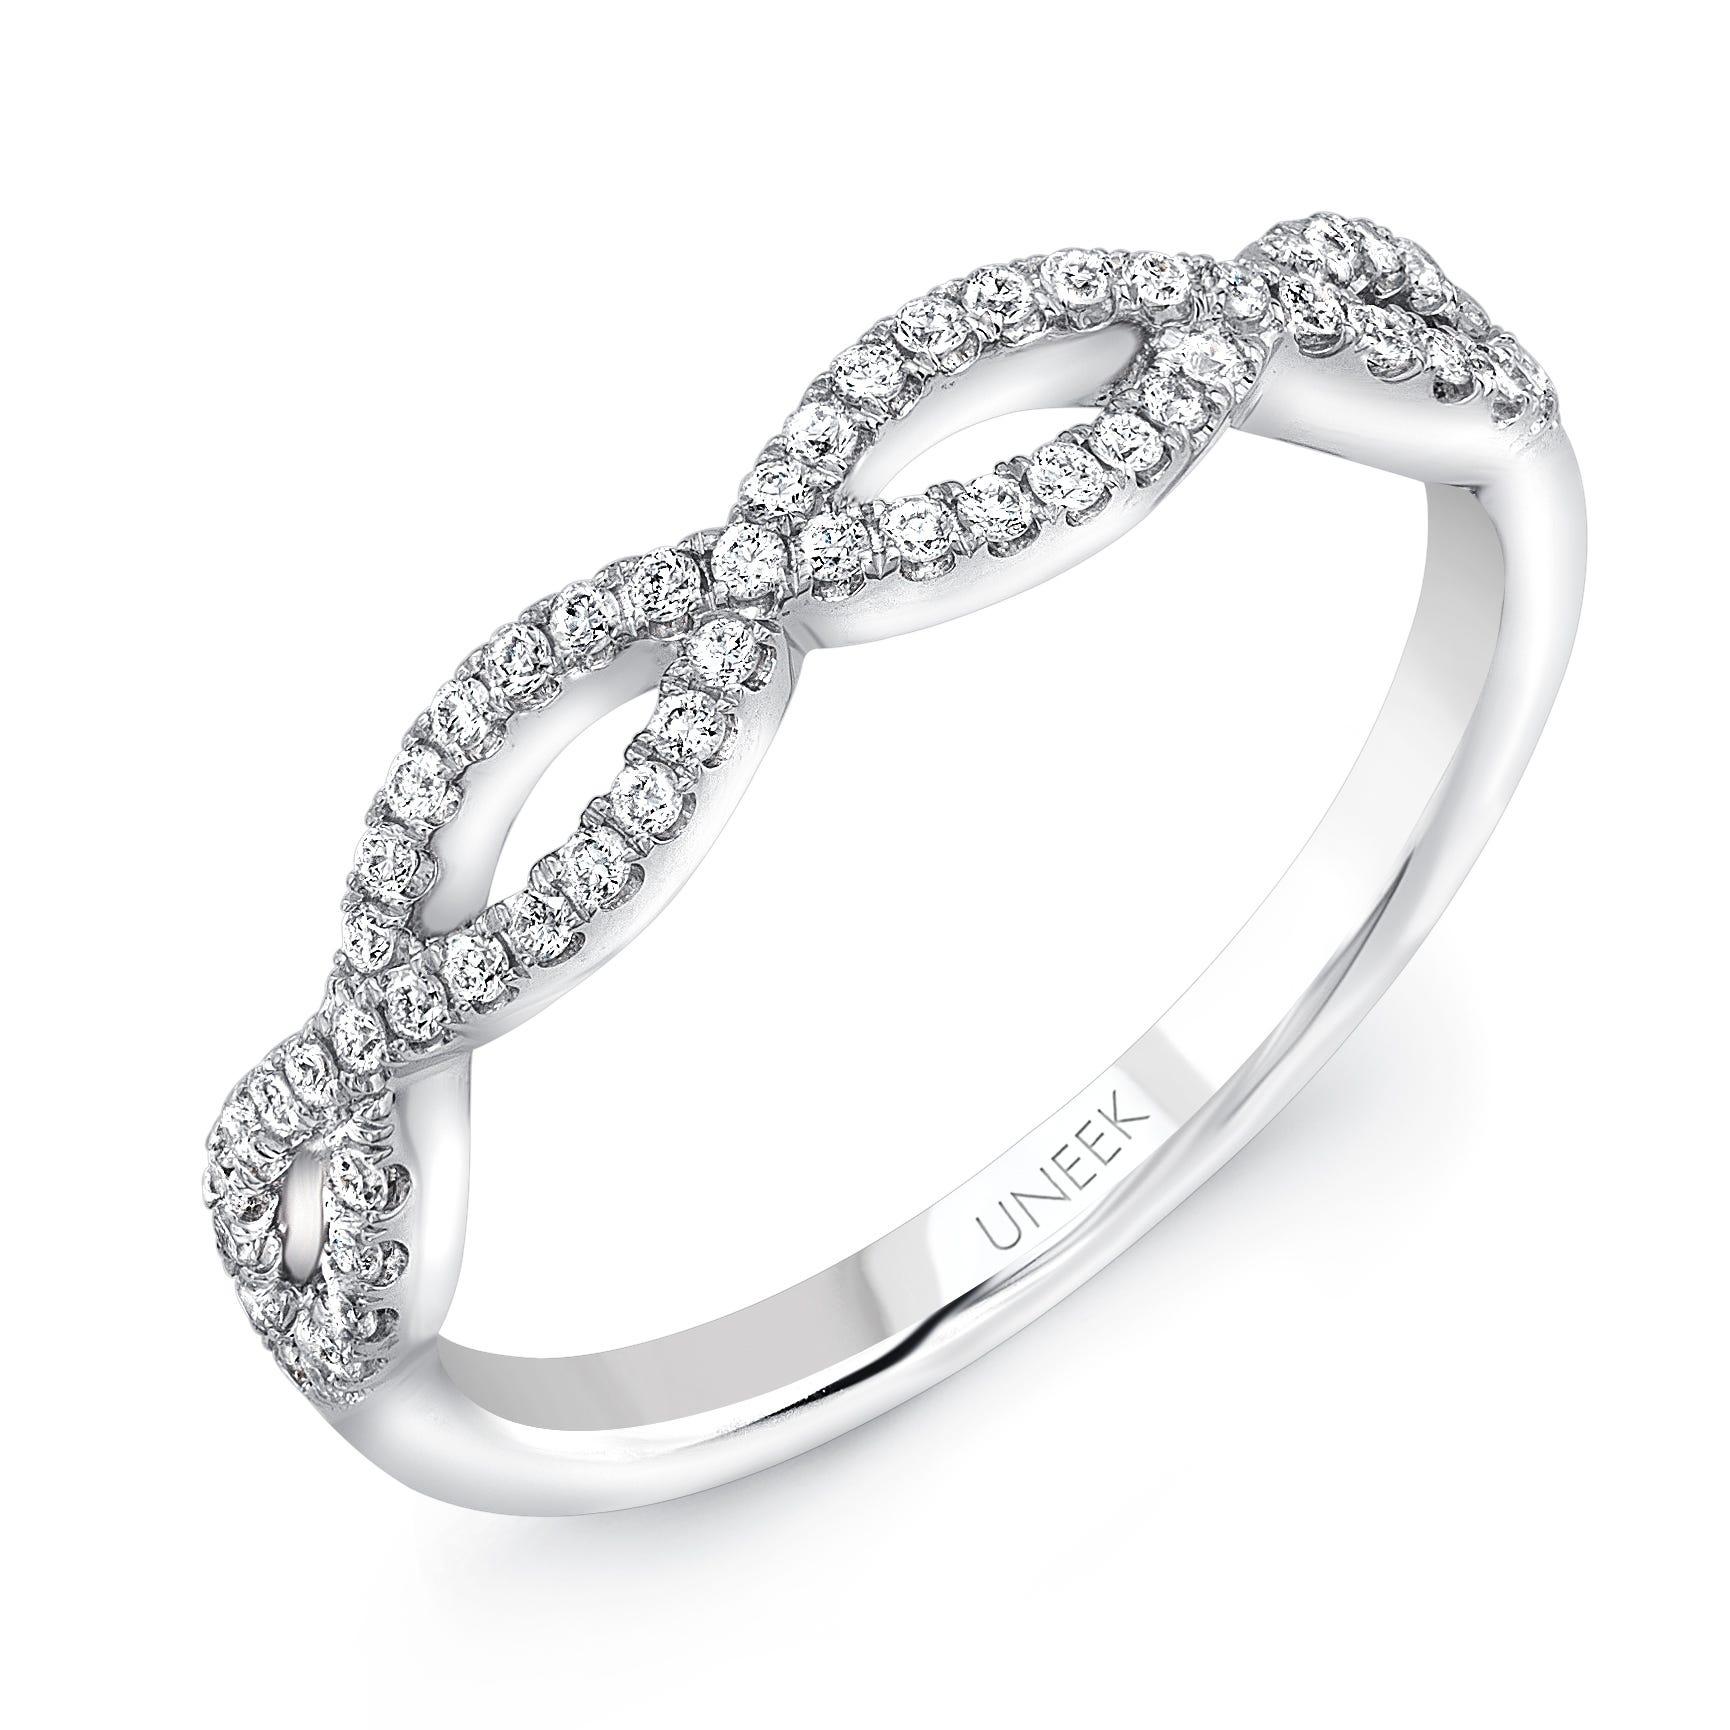 Uneek Diamond .20ctw. Infinity Wedding Band in 14K White Gold SWS189